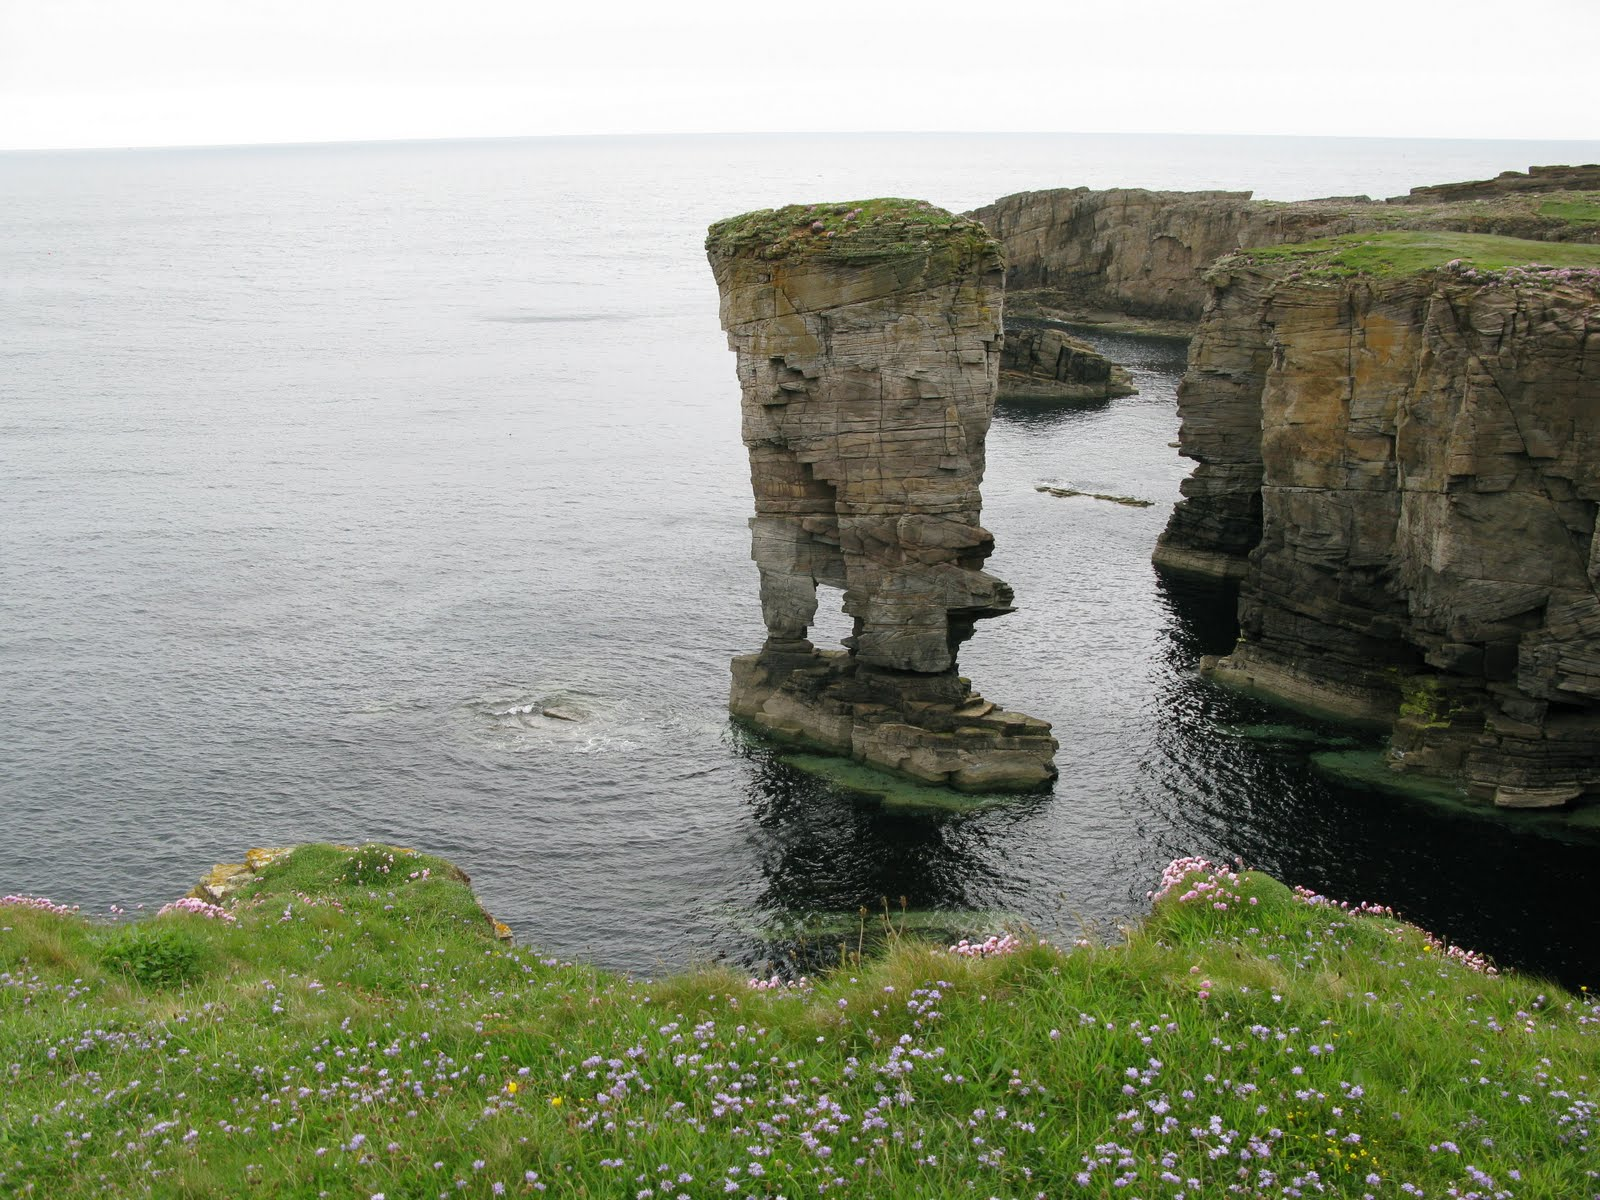 caves arches stacks and stumps diagram 2005 chrysler sebring wiring cave formation stalagmites elsavadorla